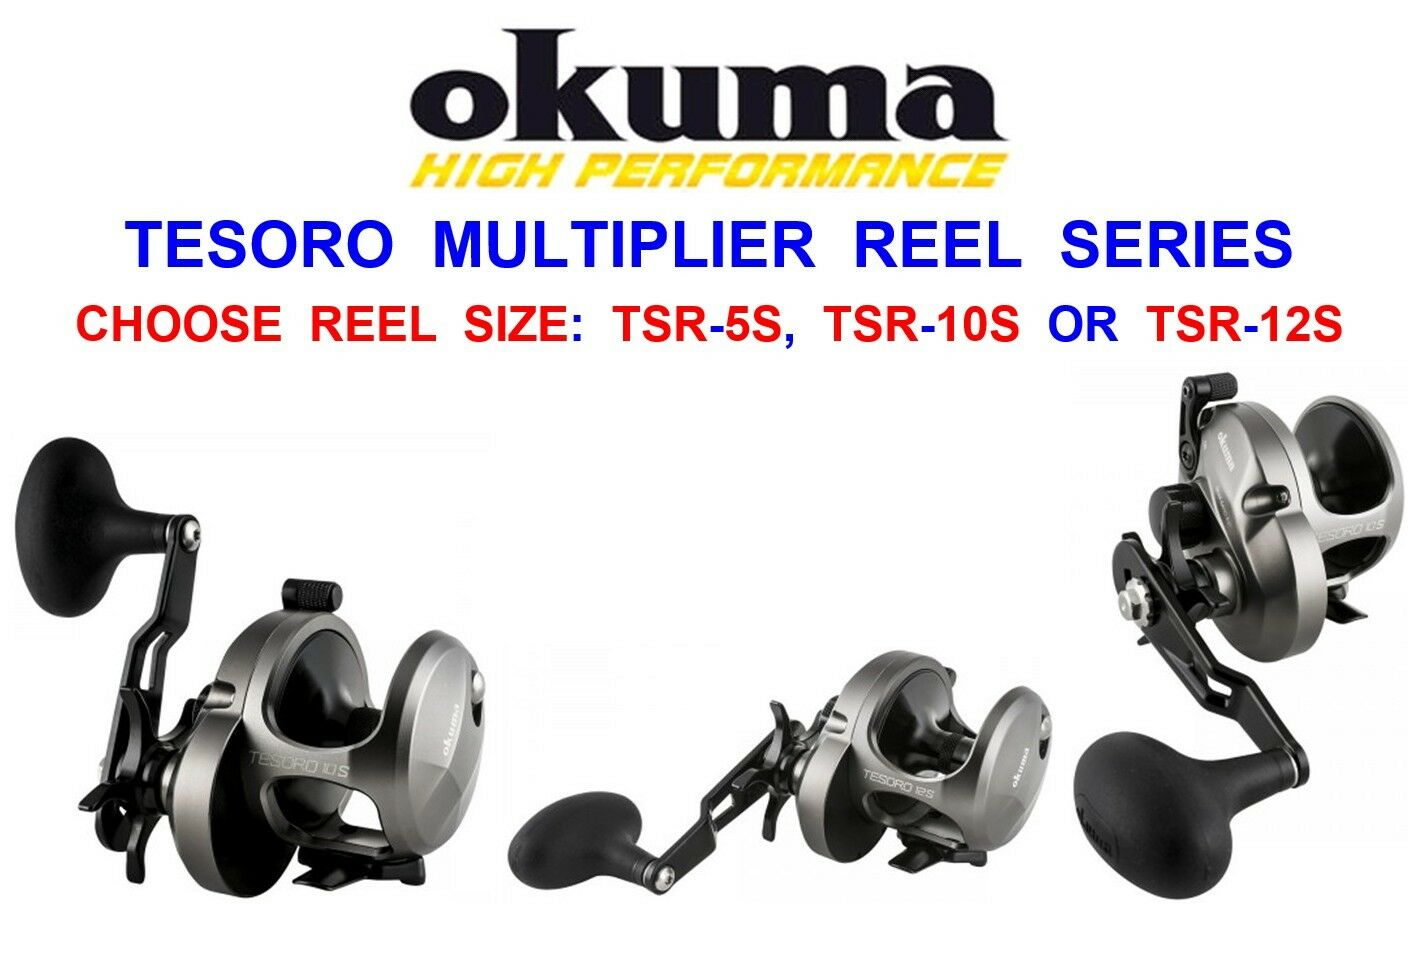 OKUMA TESgold HIGH SPEED MULTIPLIER REEL FOR SURF SEA FISHING LINE BOAT ROD LURES